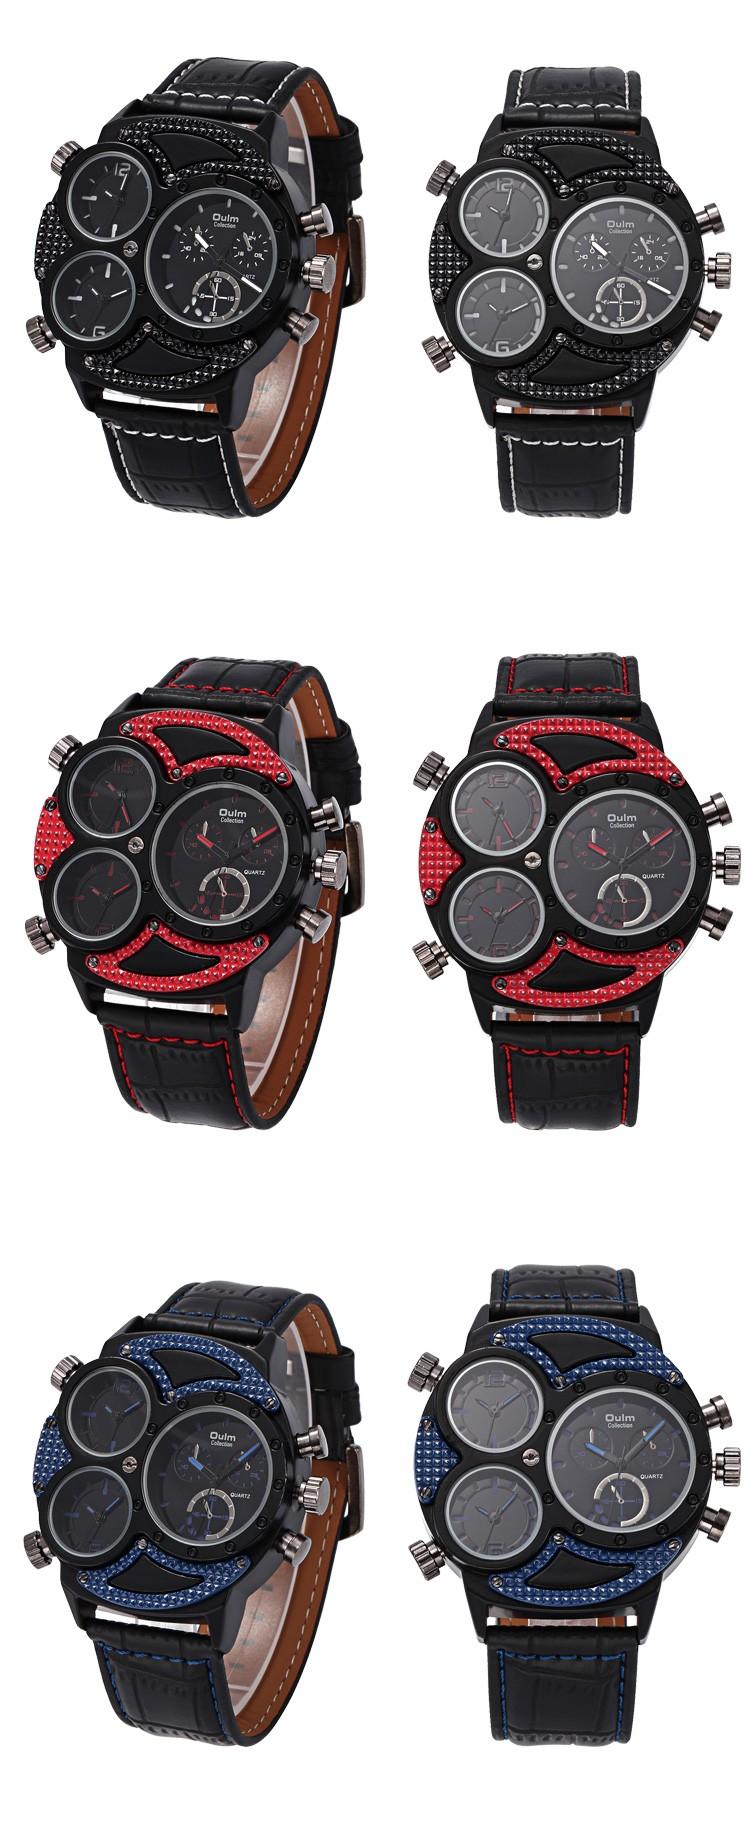 2016 Oulm luxury Brand HP3594-2 Мужские Часы Множественный Часовой пояс Наручные часы спортивные часы мужчин